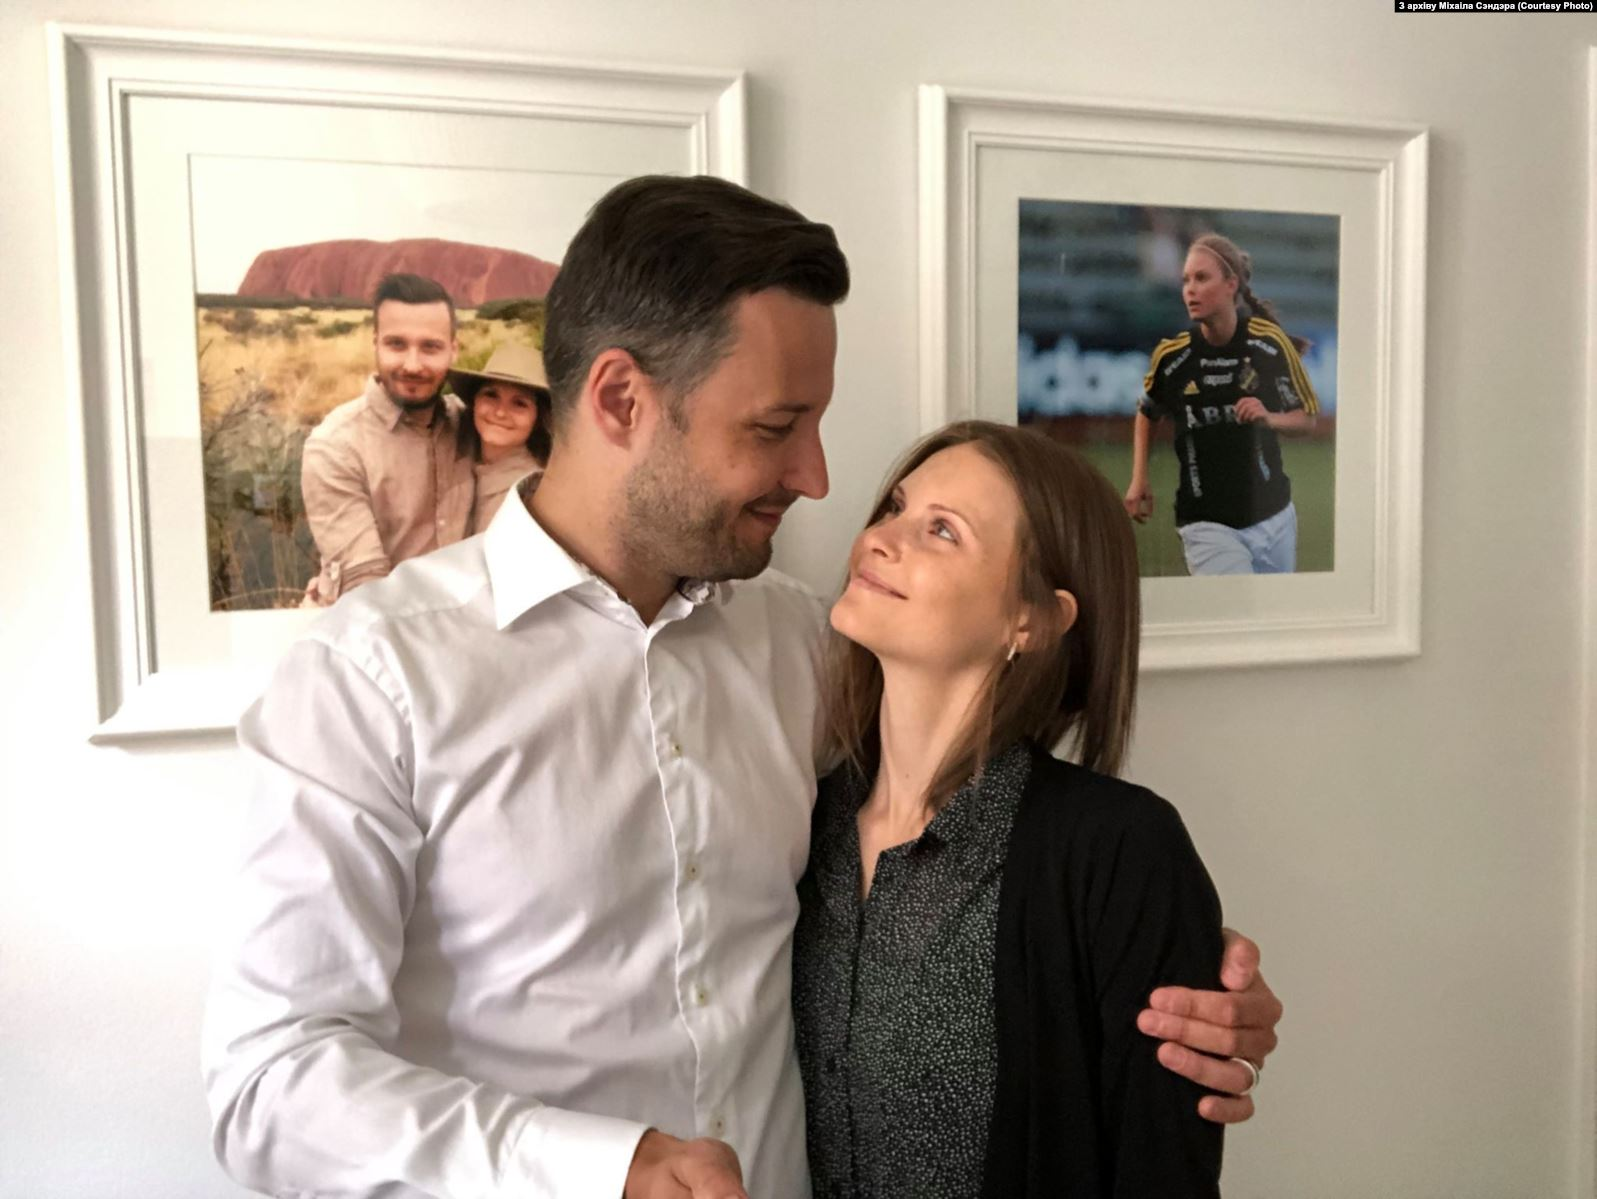 Michael Sender with Emelie Karlsson Wedin